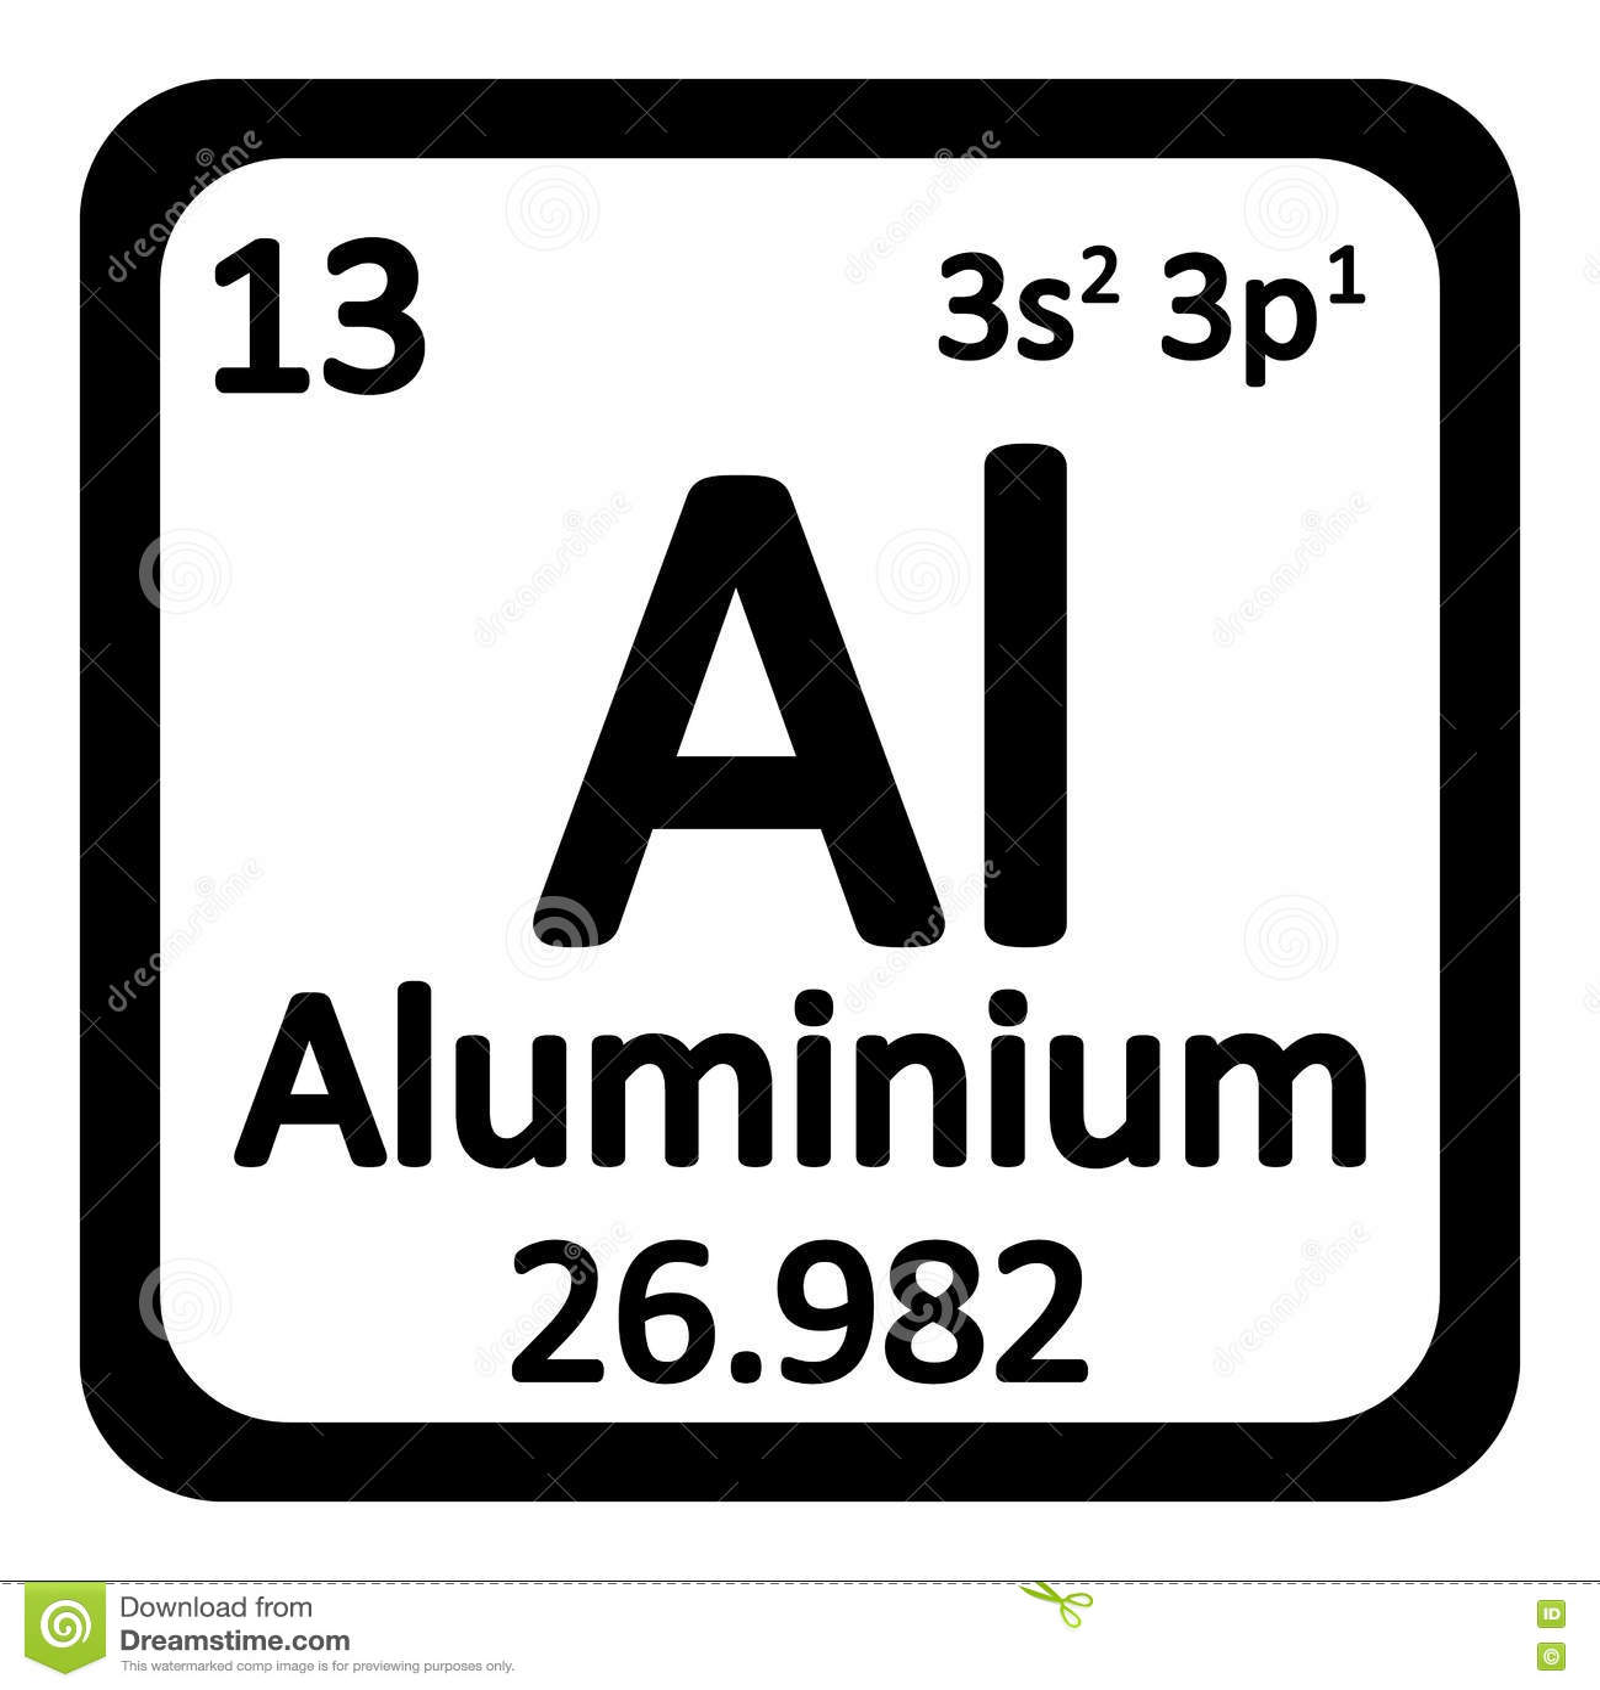 Periodic table element aluminium icon stock illustration image royalty free illustration download periodic table element aluminium gamestrikefo Gallery